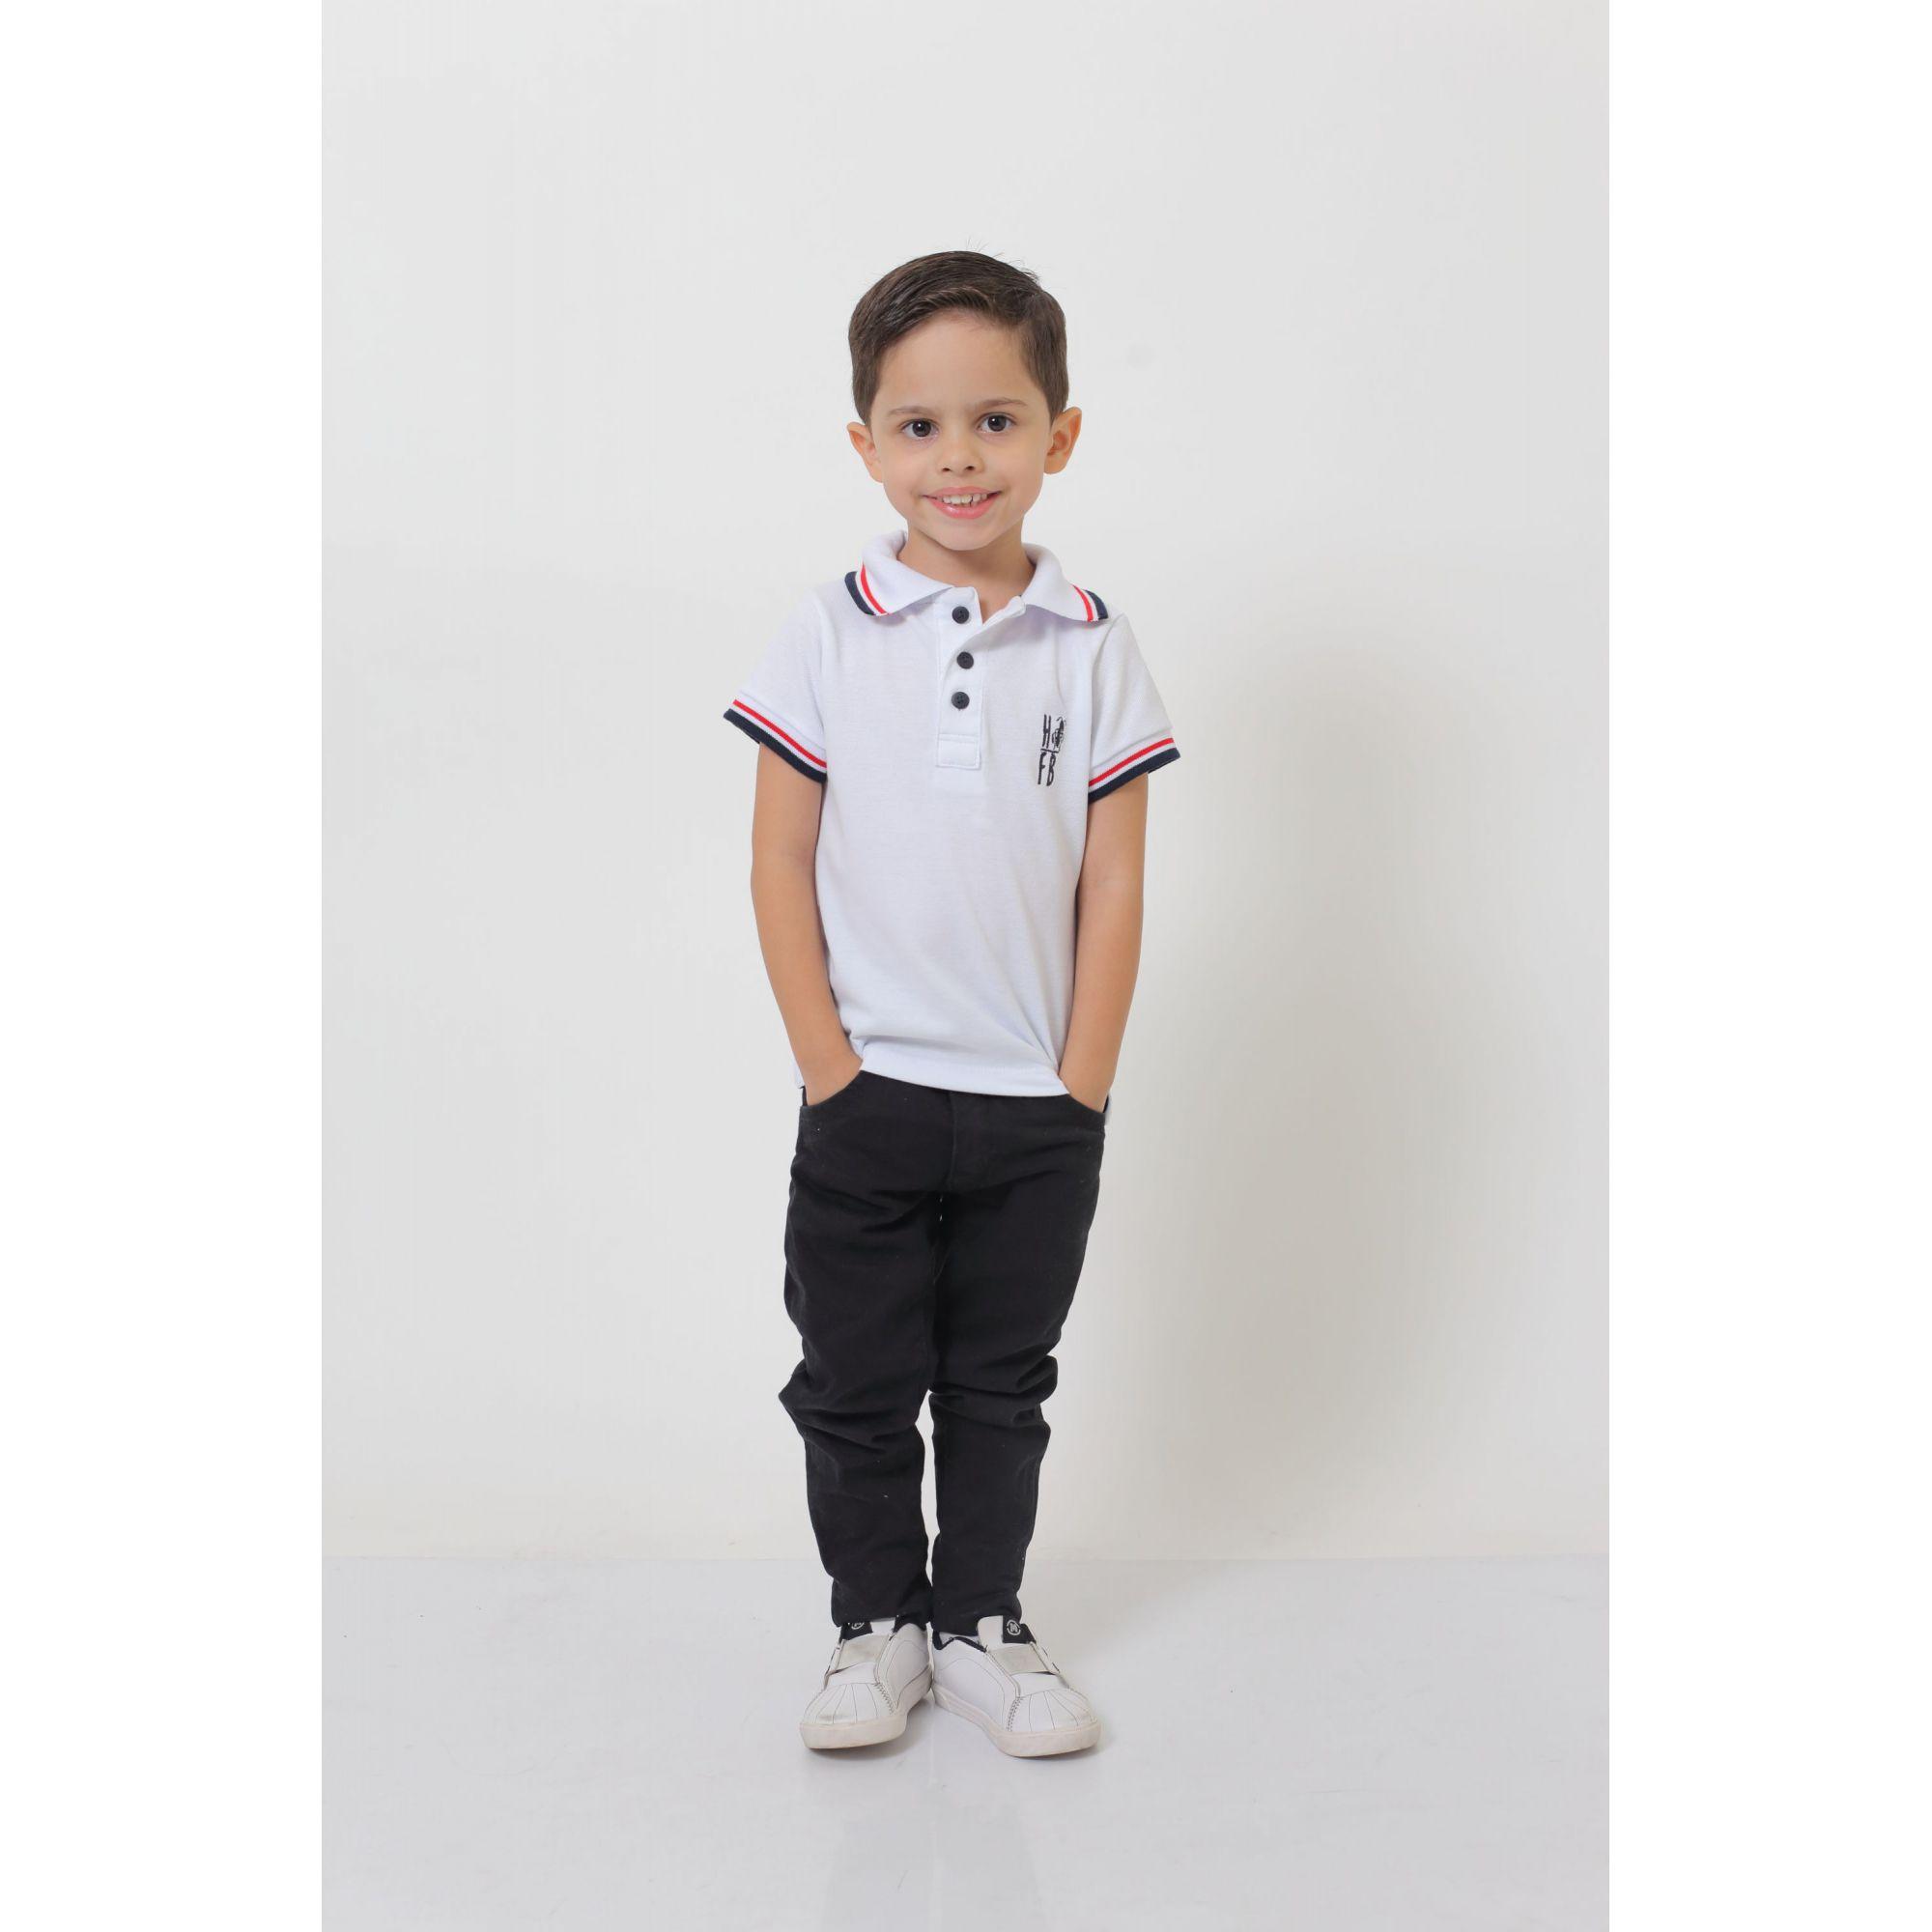 Camisa Polo ou Body Polo Infantil Branca  - Heitor Fashion Brazil